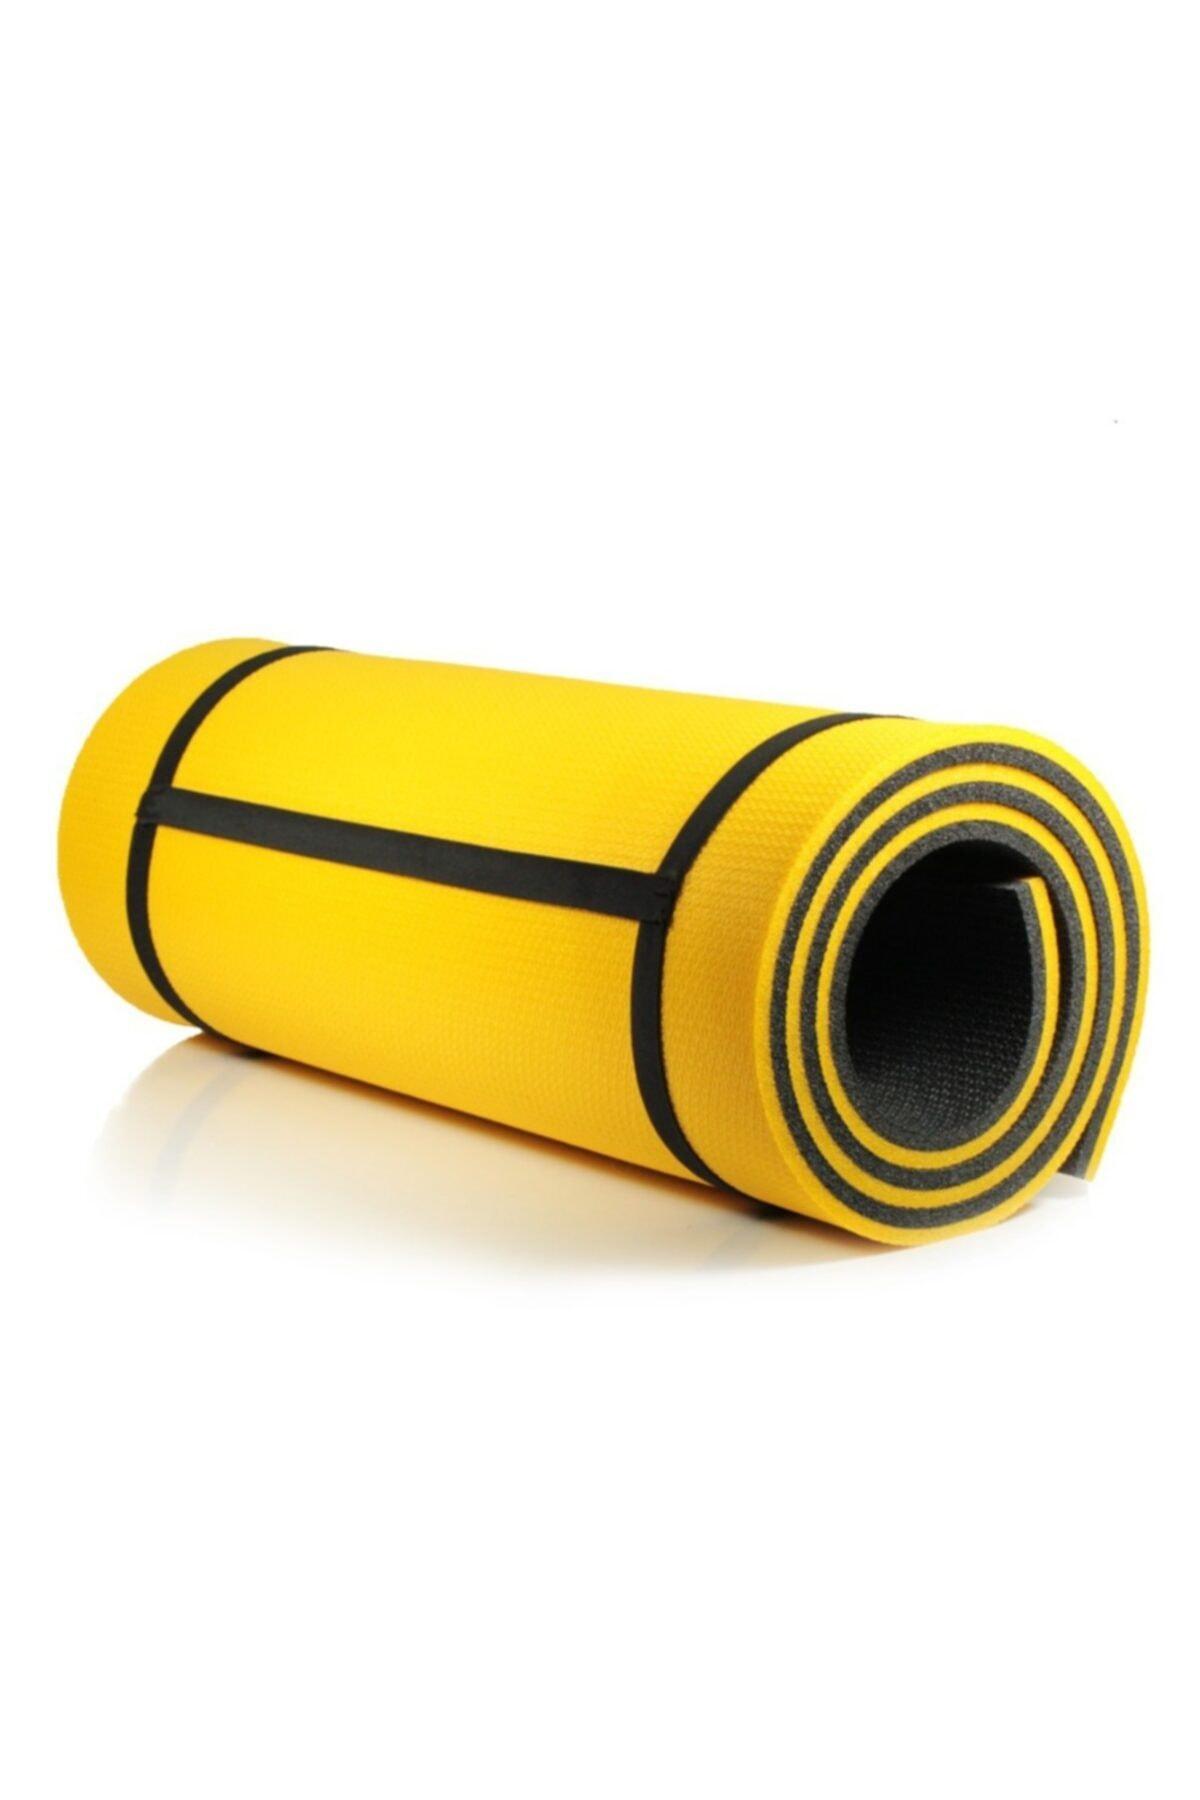 Walke 16 Mm Çift Taraflı Sarı-siyah Pilates Matı 180 Cm 1